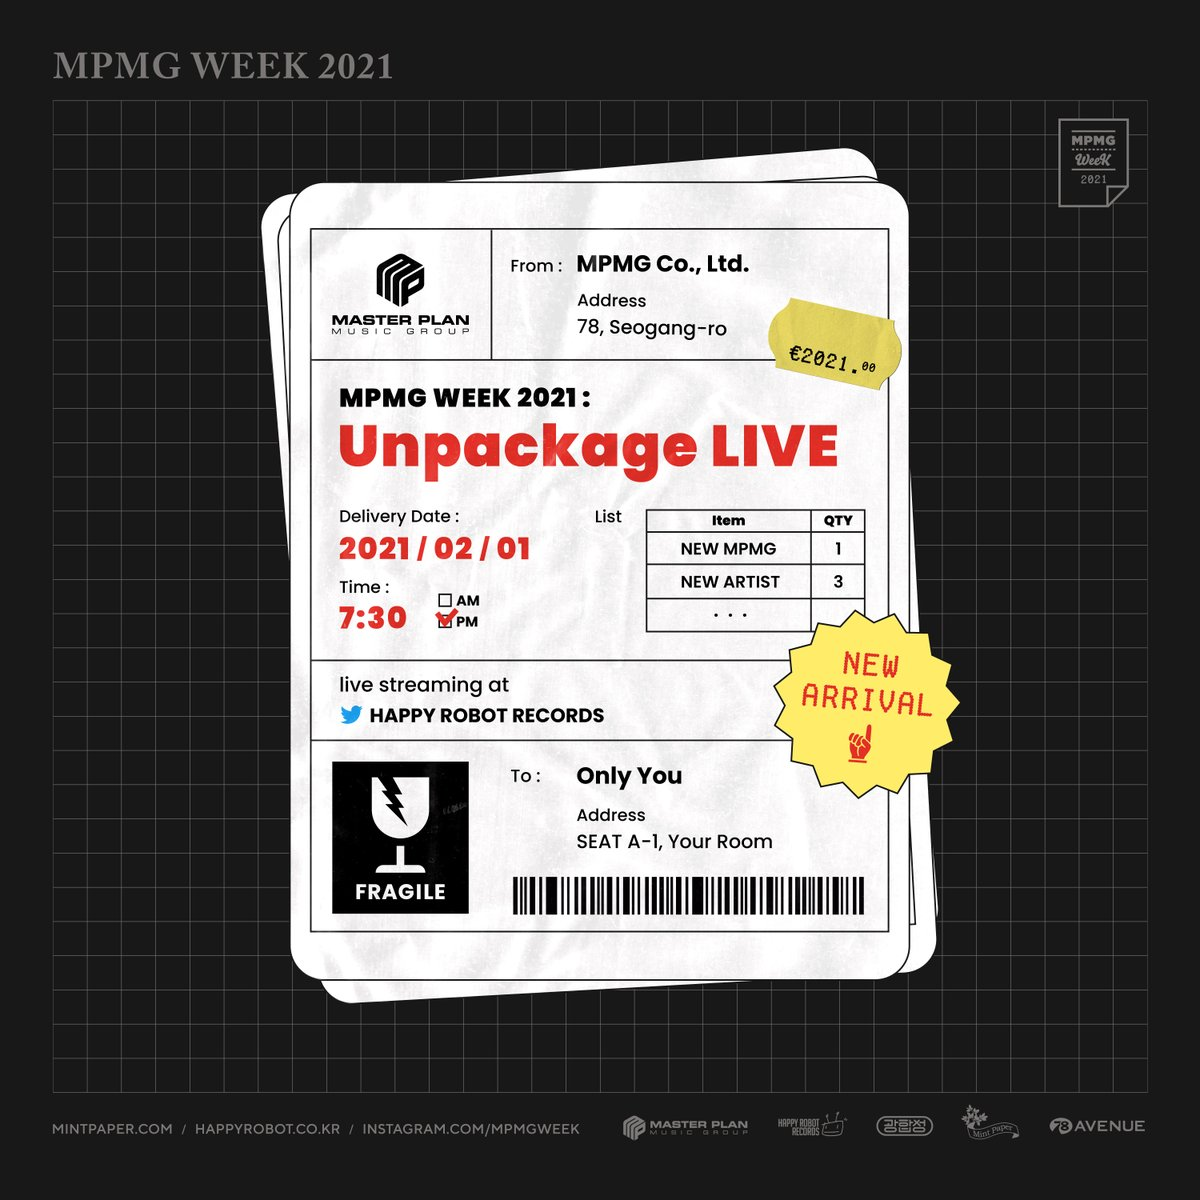 [𝐌𝐏𝐌𝐆 𝐖𝐄𝐄𝐊 𝟐𝟎𝟐𝟏 𝐏𝐫𝐨𝐠𝐫𝐚𝐦] MPMG WEEK 2021 : Unpackage LIVE ⠀ ⏱ 일시: 2021.2.1(월) 7:30PM (KST) ⏱ 송출: Happy Robot Records Twitter (@HappyRobotKR) 📣 라인업: New Artists, MC 고영배 (소란), 이원석 (데이브레이크), 박솔 (솔루션스), 홍동균 (쏜애플) and more...